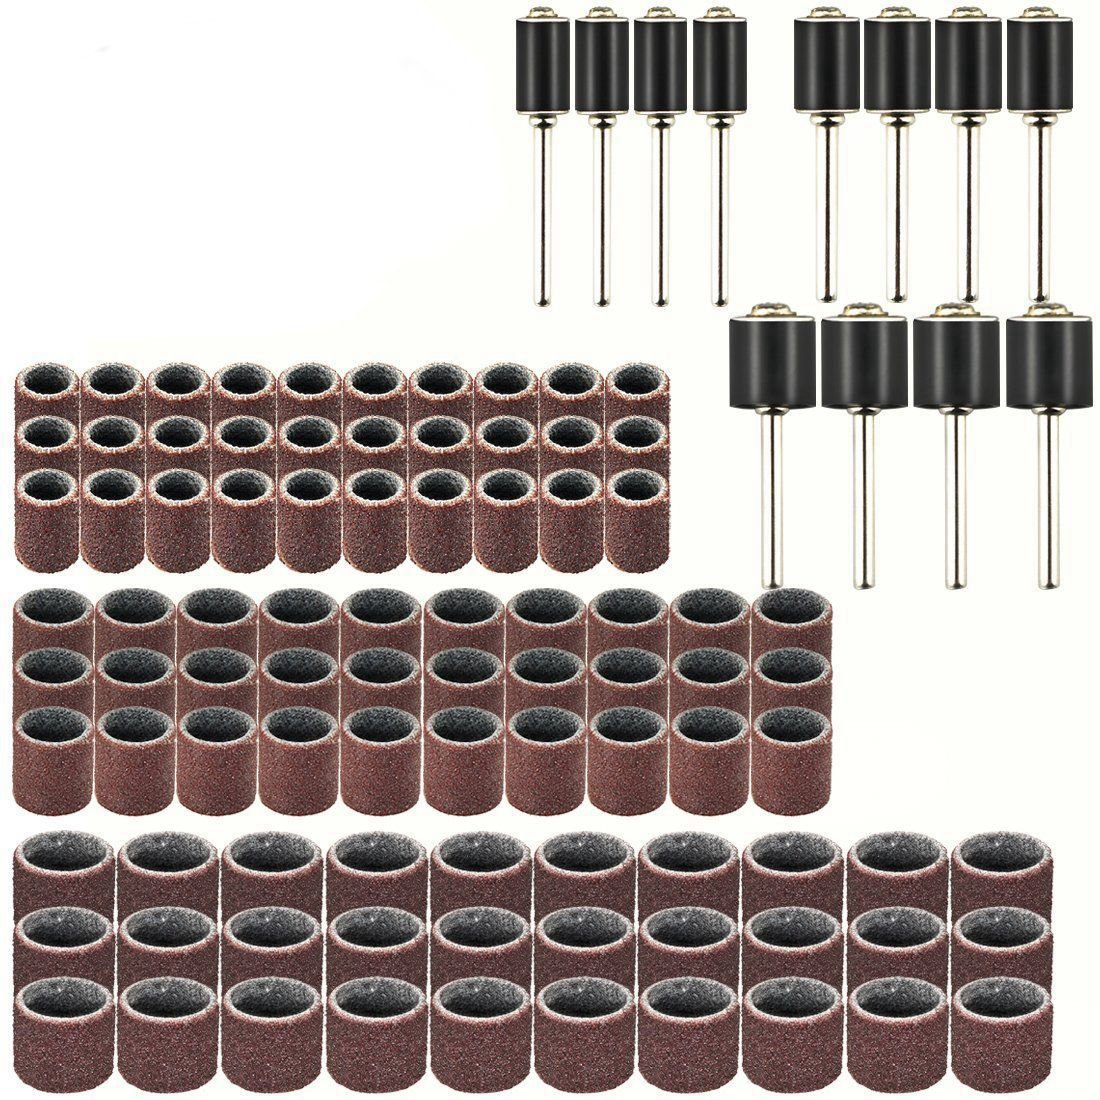 SODIAL Drum Sander Set Including 90Pcs Sanding Band Sleeves, 12Pcs Drum Mandrels for Rotary Drll Tool (102pack)